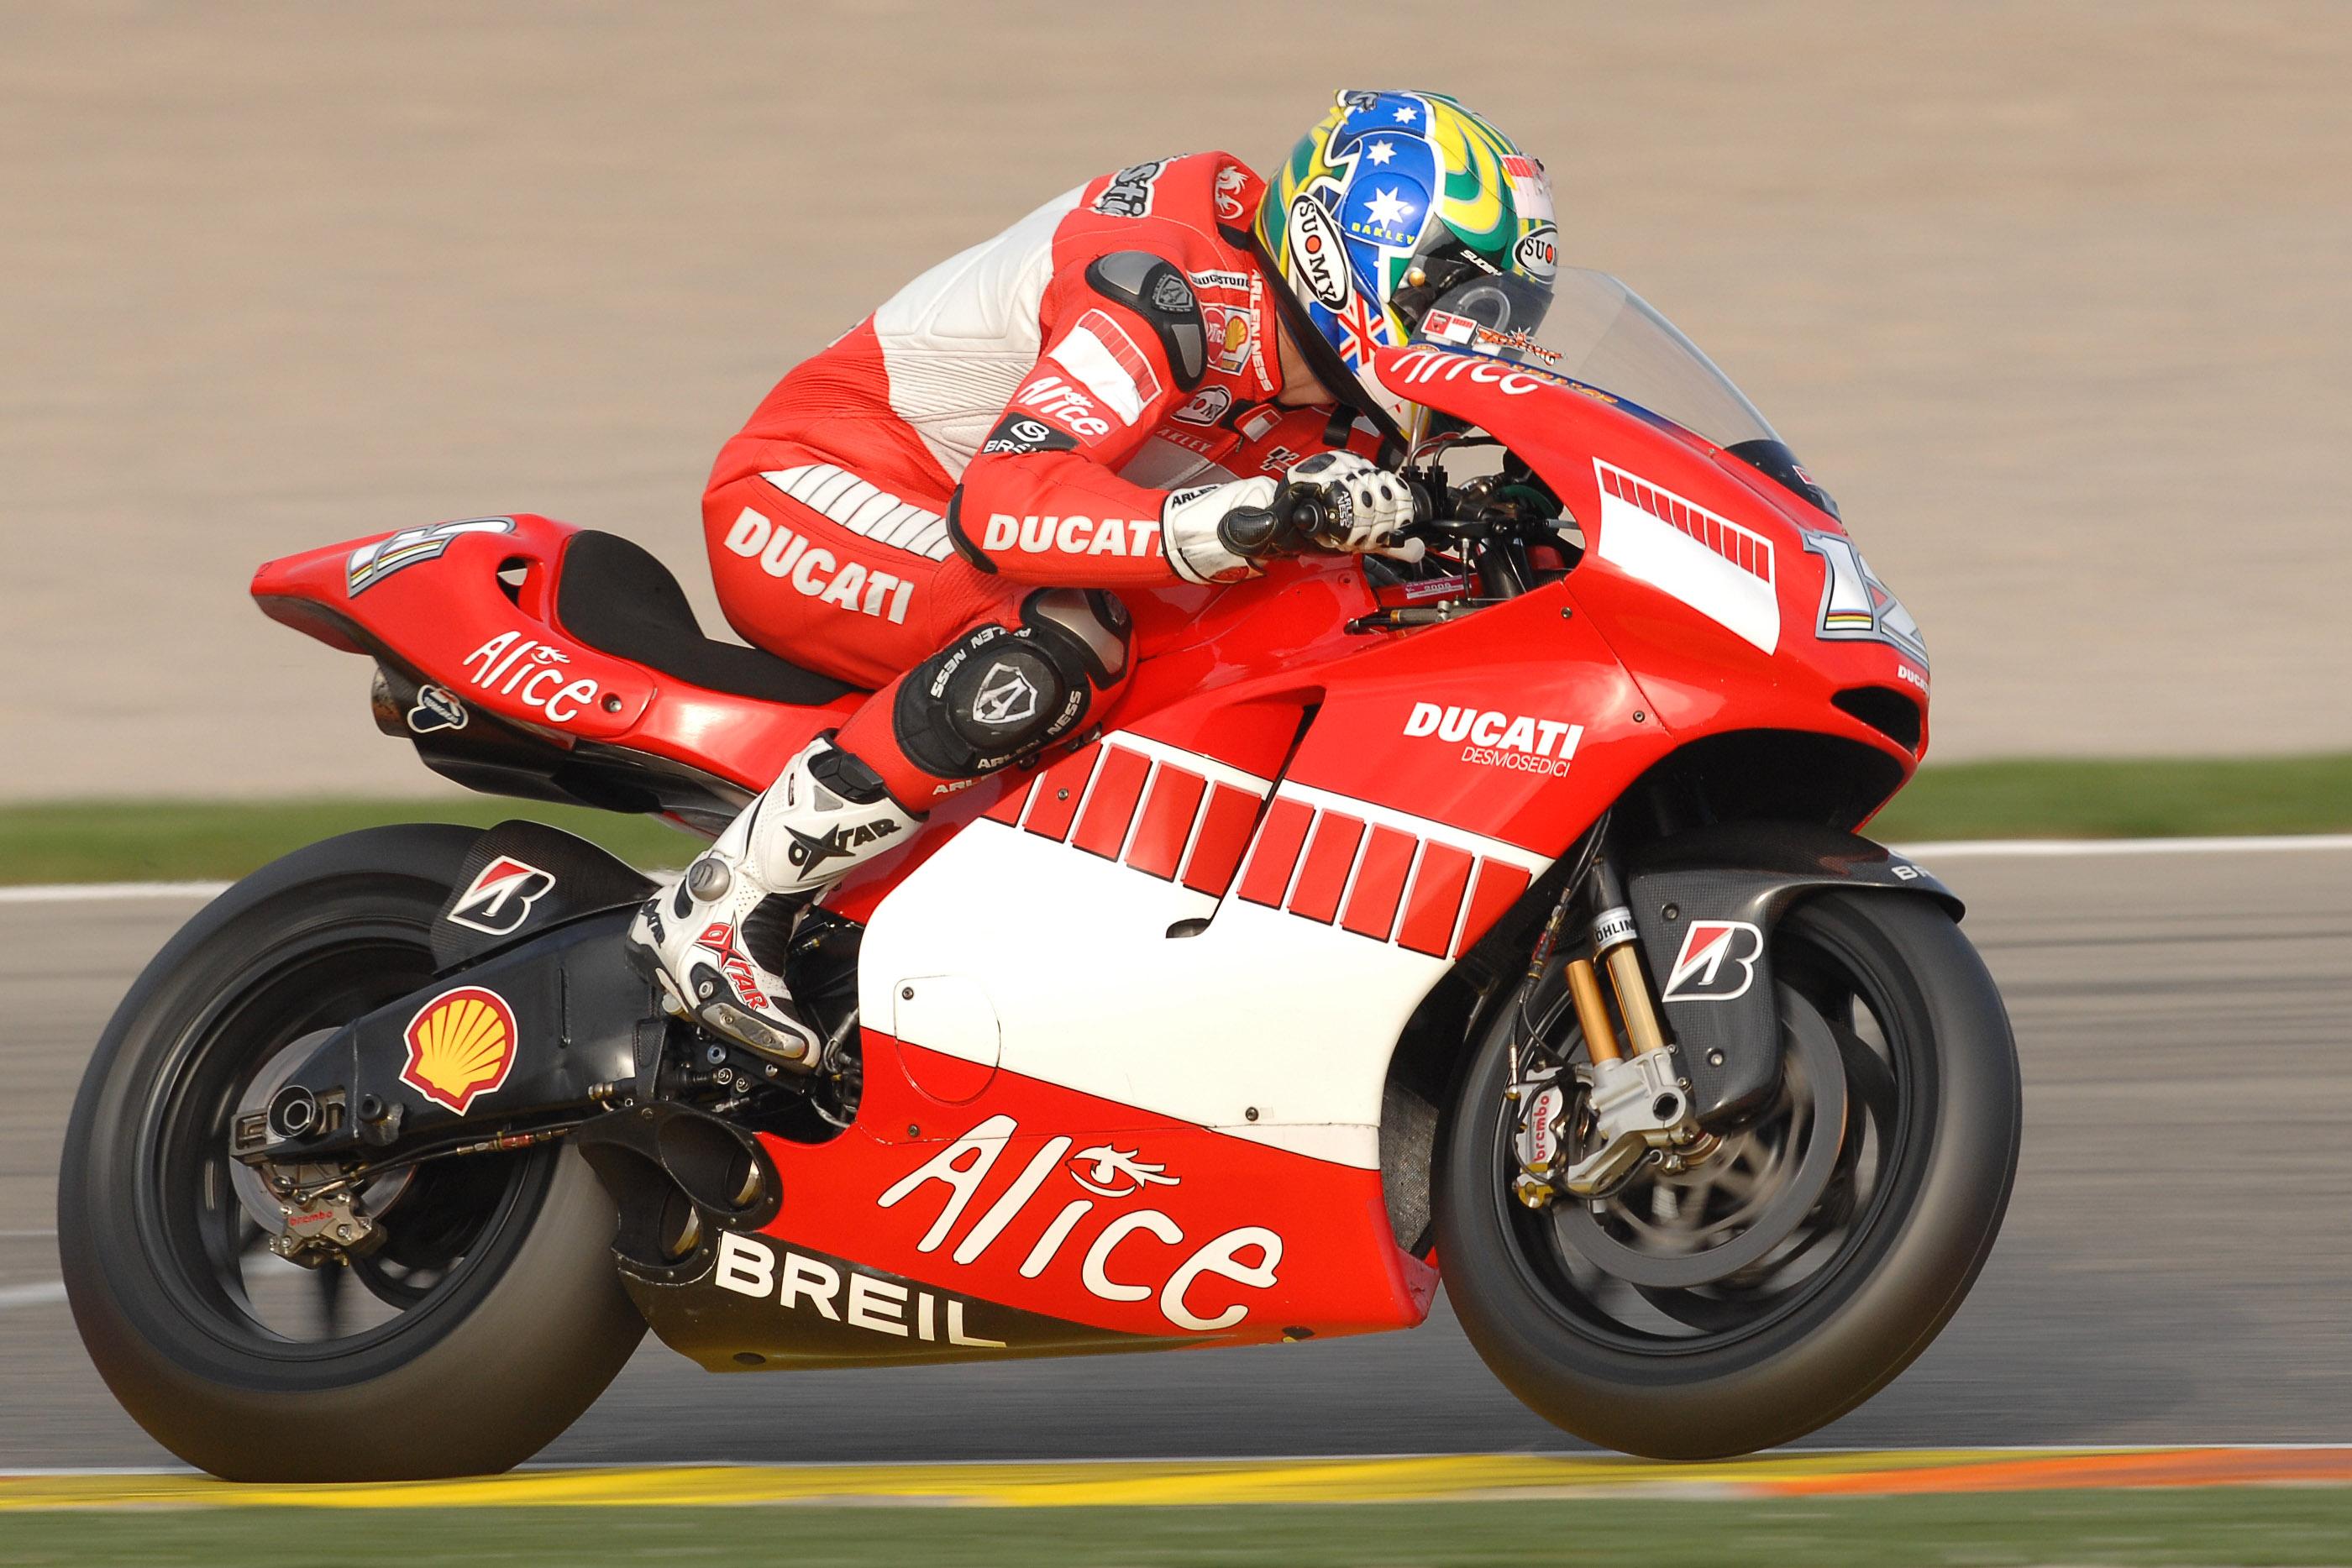 Ducati GP6 Bejlis Valensija